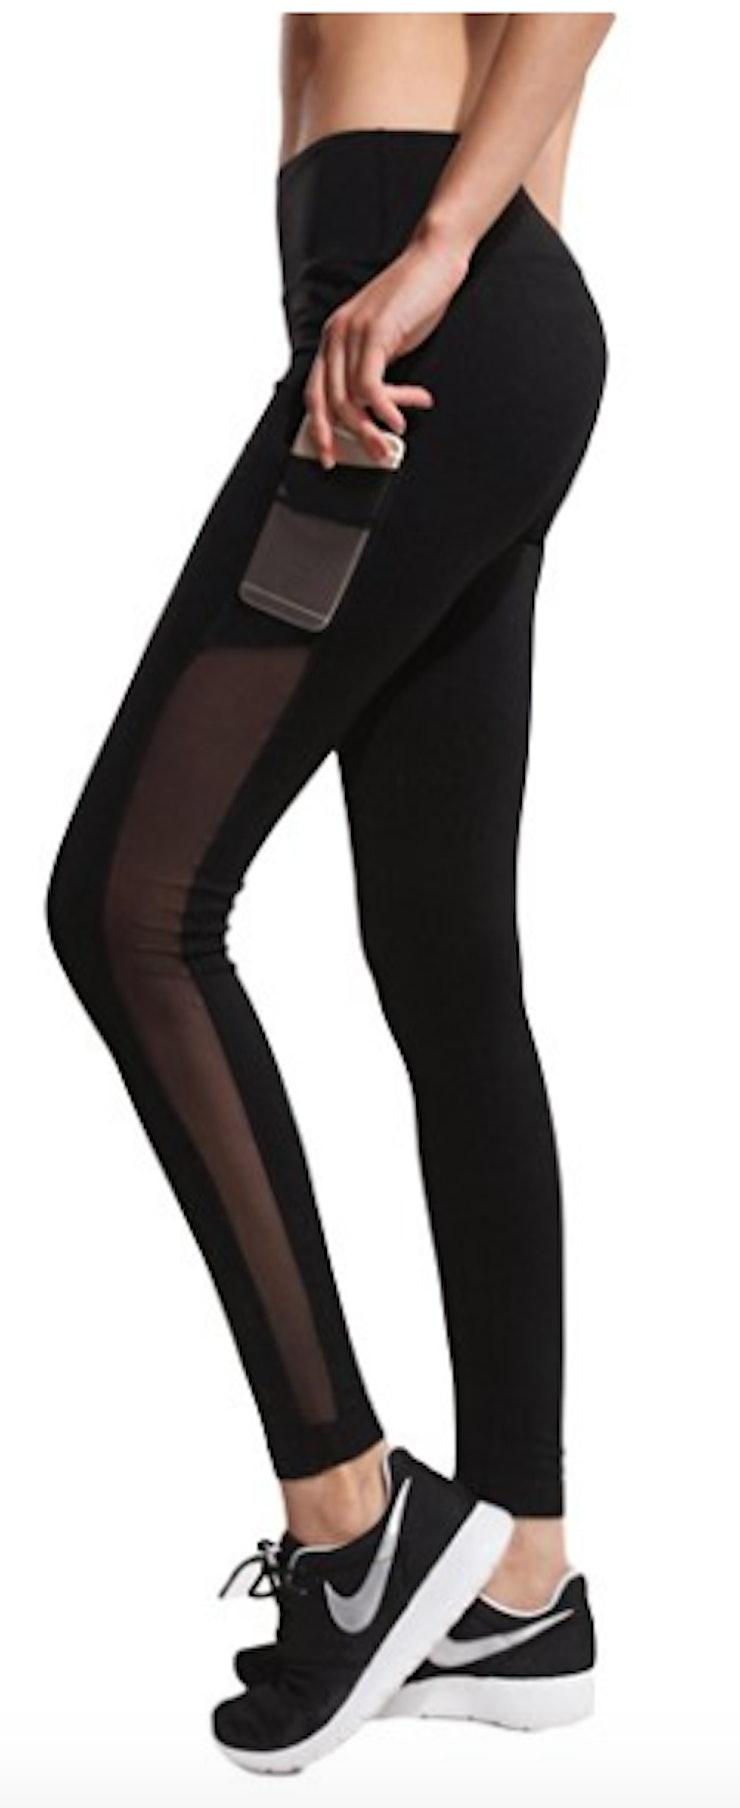 14 Stylish Workout Pants & Leggings With Pockets